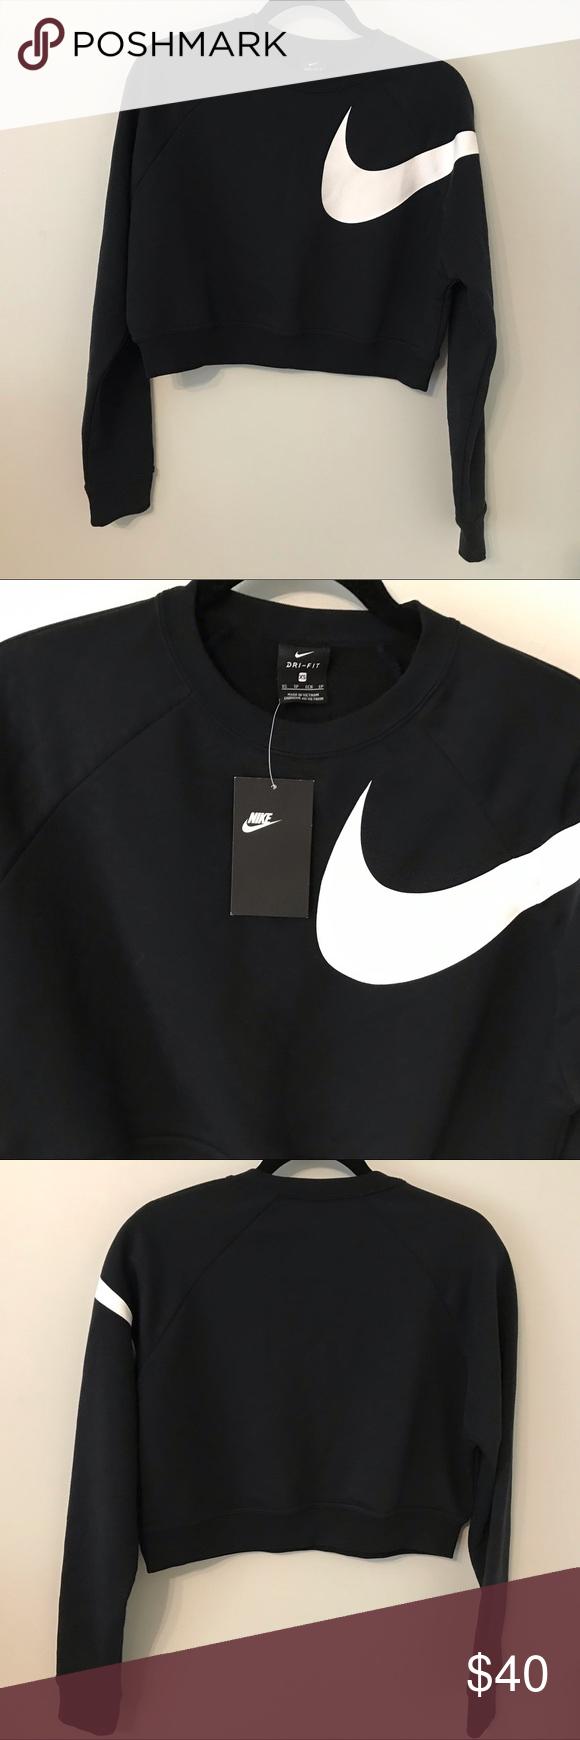 Nike Cropped Crew Neck Sweatshirt Xs Nwt Nike Dri Fit Cropped Crew Neck Sweatshirt In Black With White Nike Swoosh Crew Neck Sweatshirt White Nikes Sweatshirts [ 1740 x 580 Pixel ]